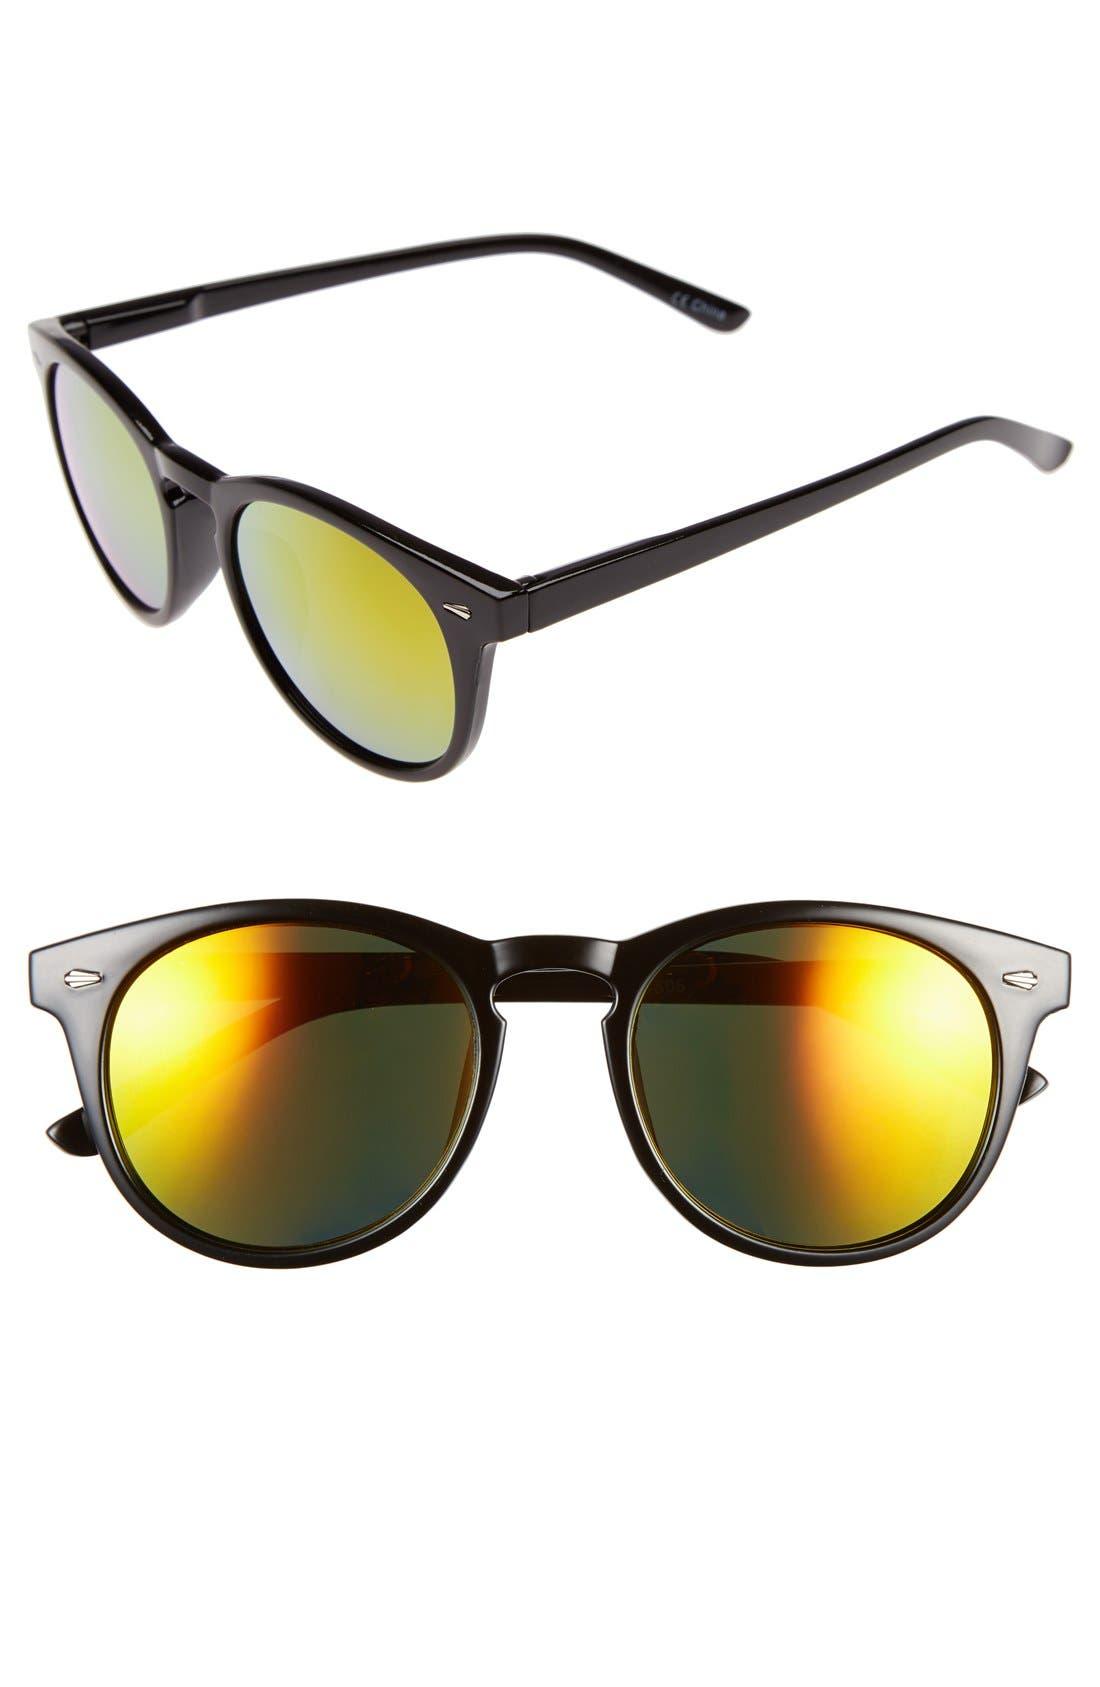 Main Image - Sole Society 'Kate' 48mm Round Mirrored Sunglasses